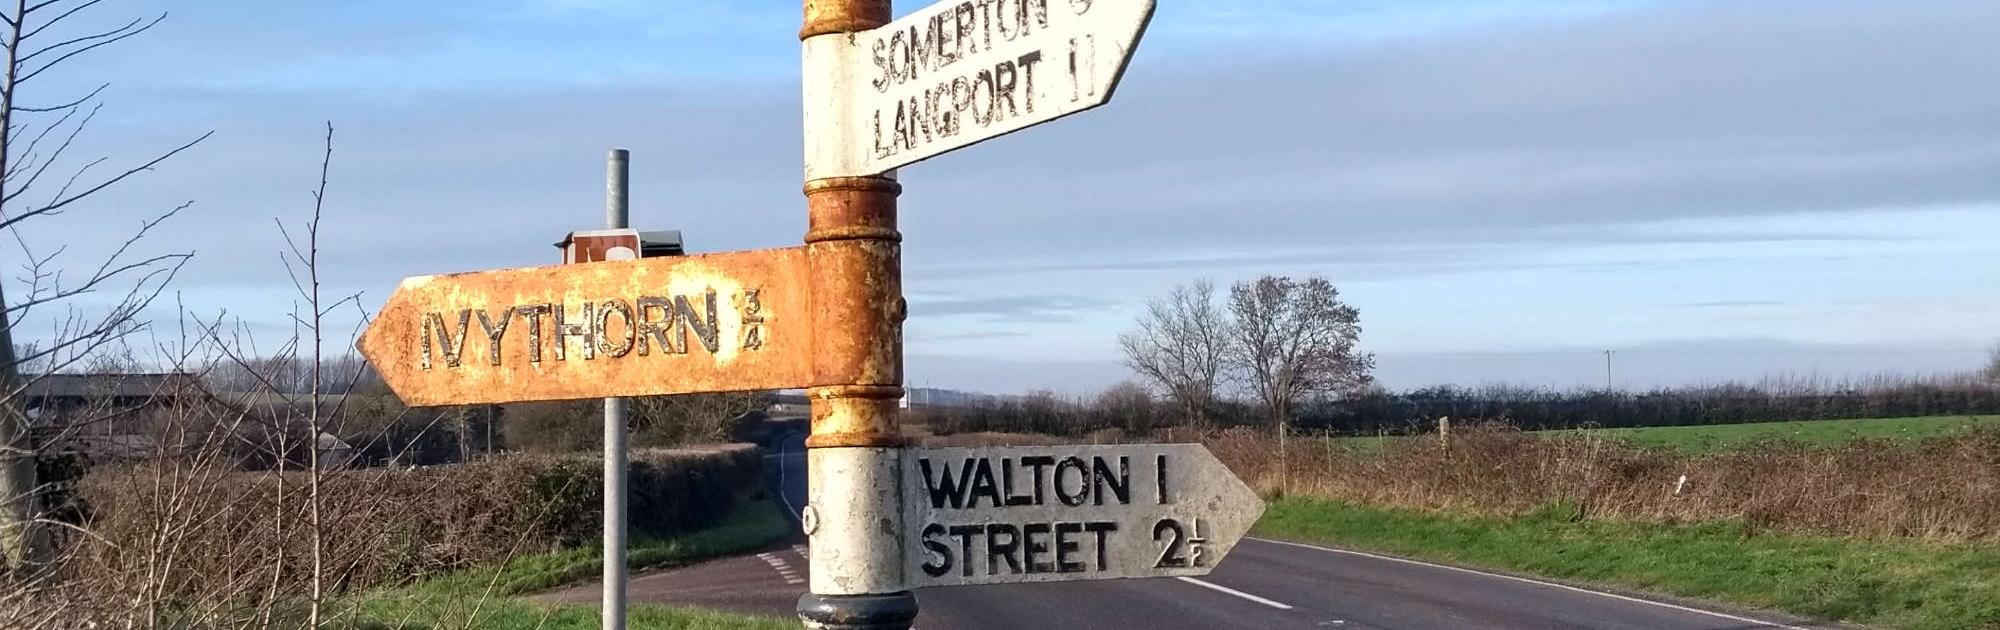 Old fingerpost signposting Walton